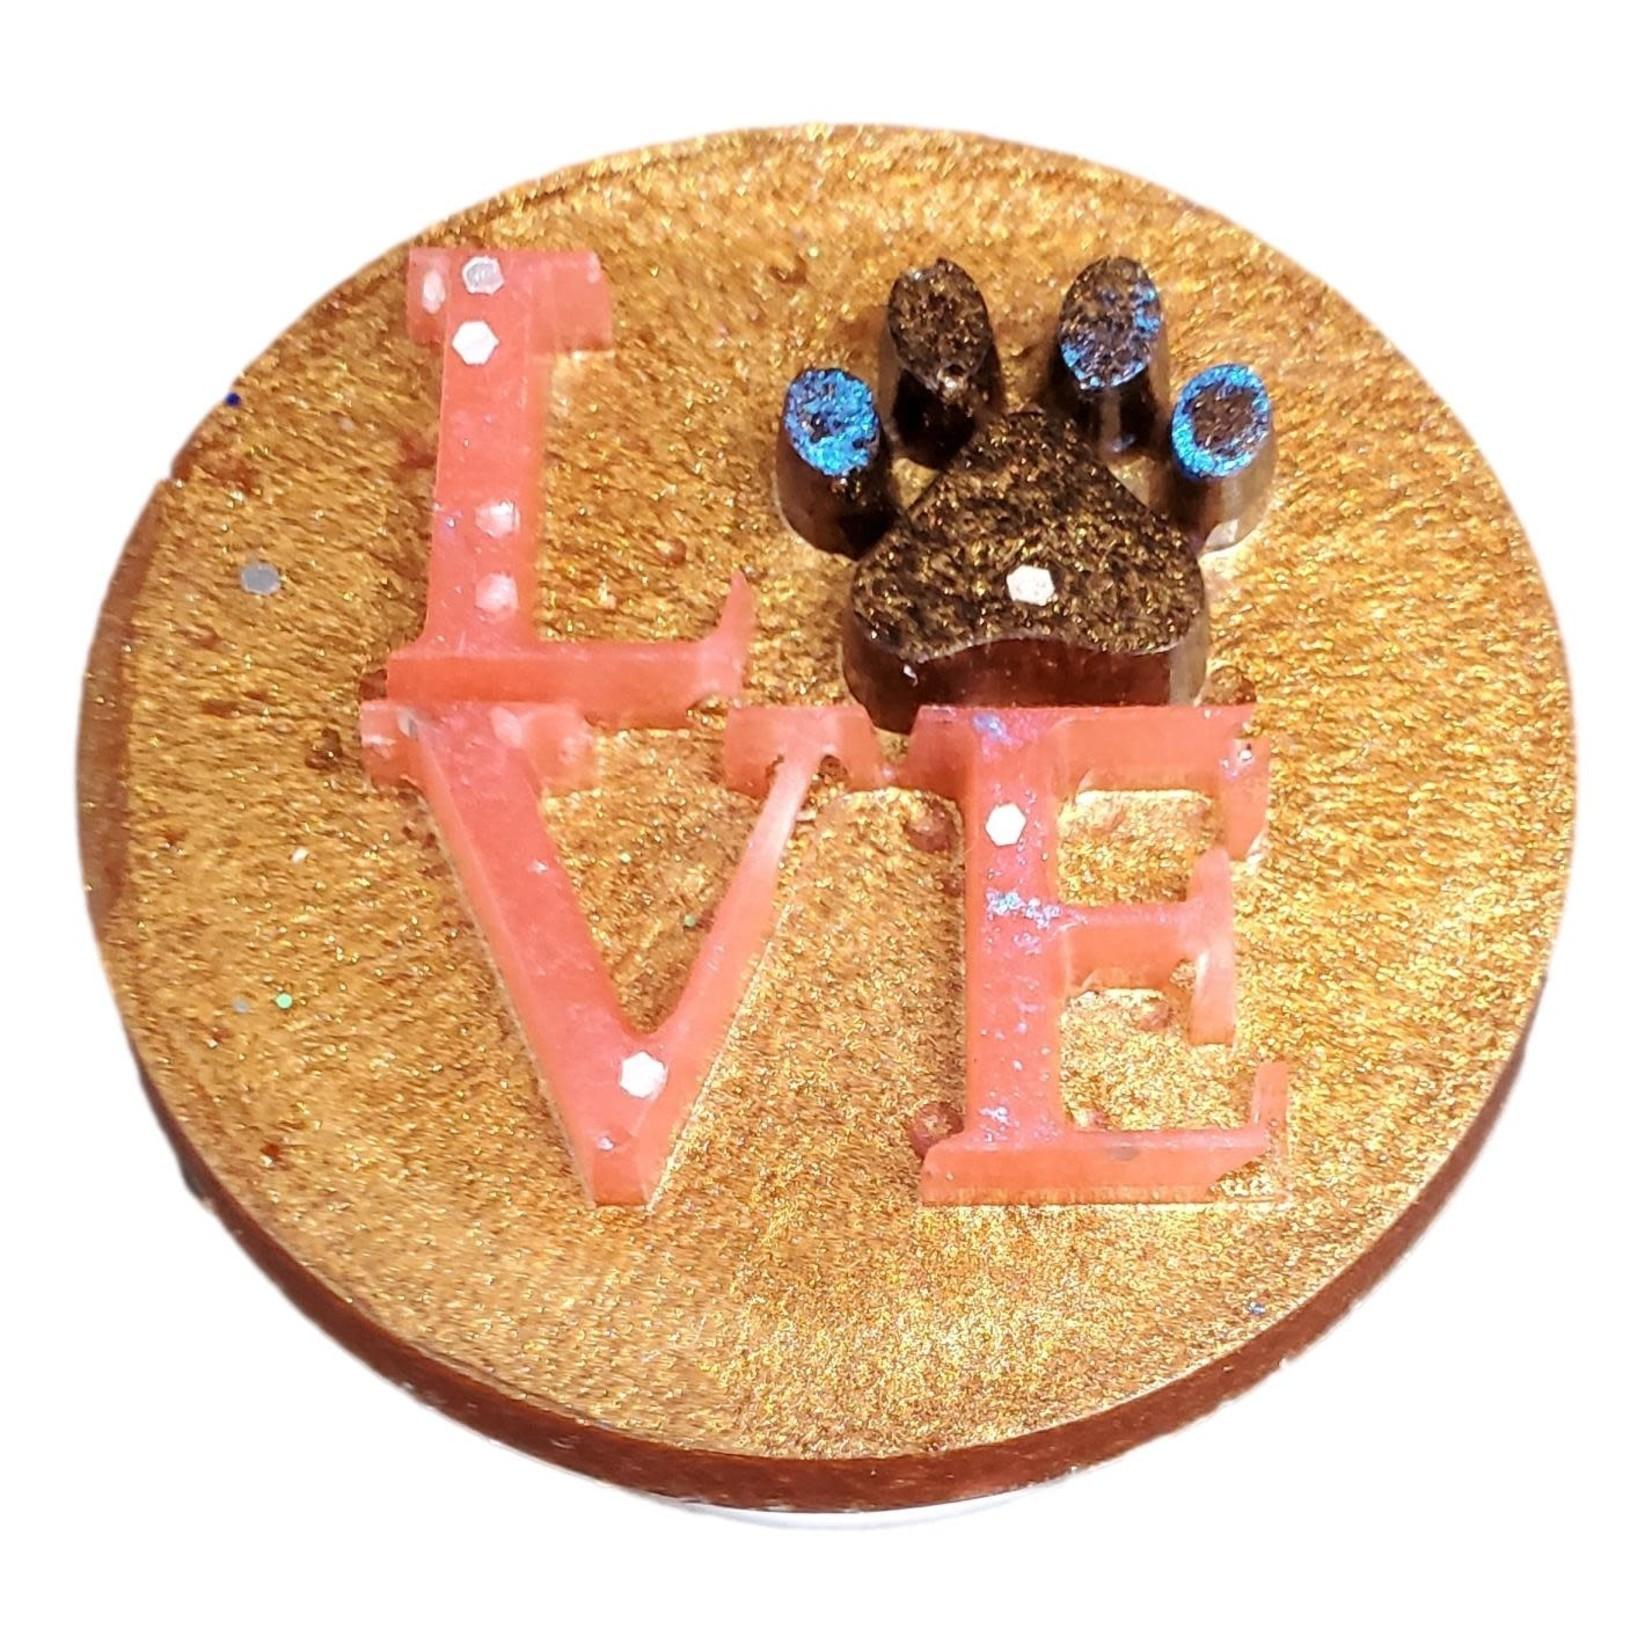 East Coast Sirens Golden Brown Puppy Love Phone Pop-up